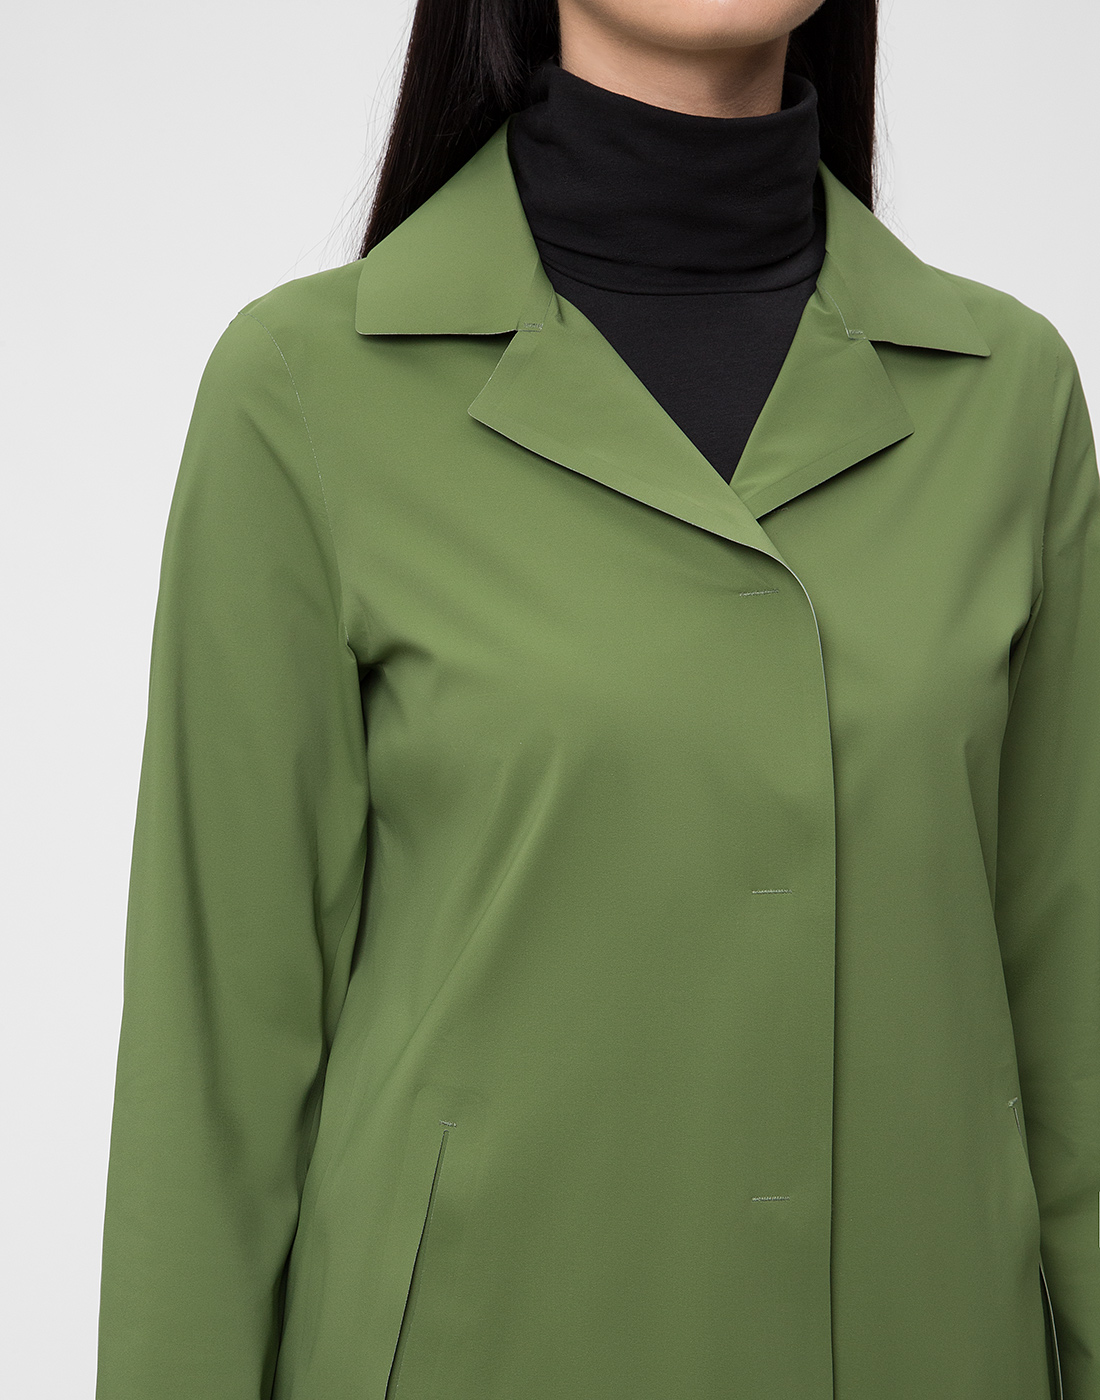 Женский зеленый плащ Herno SIM0035D-19289-7012-6